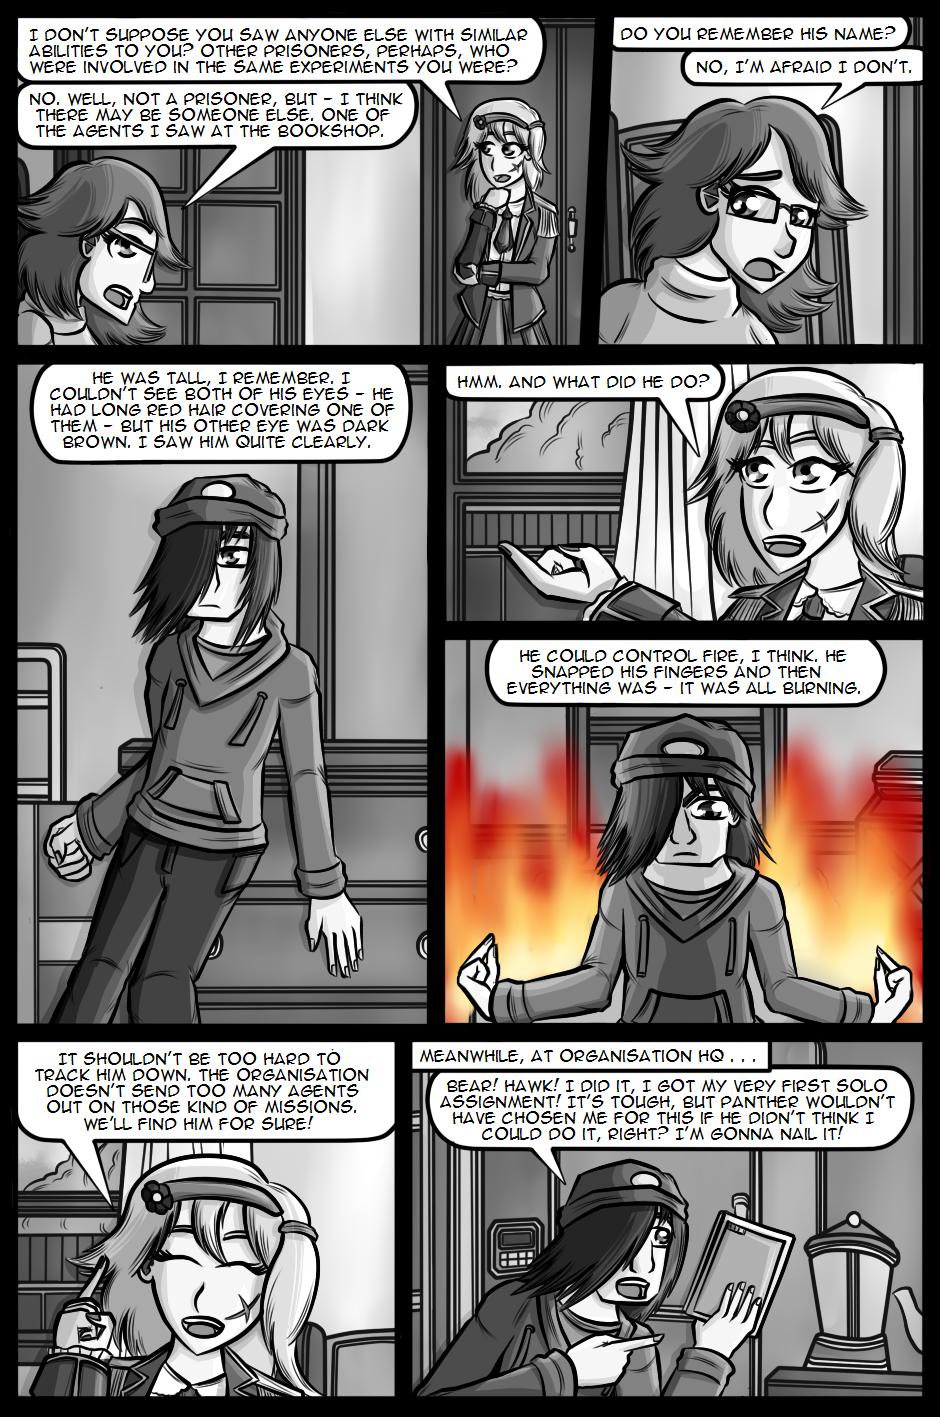 Fire Suppression, Part 6